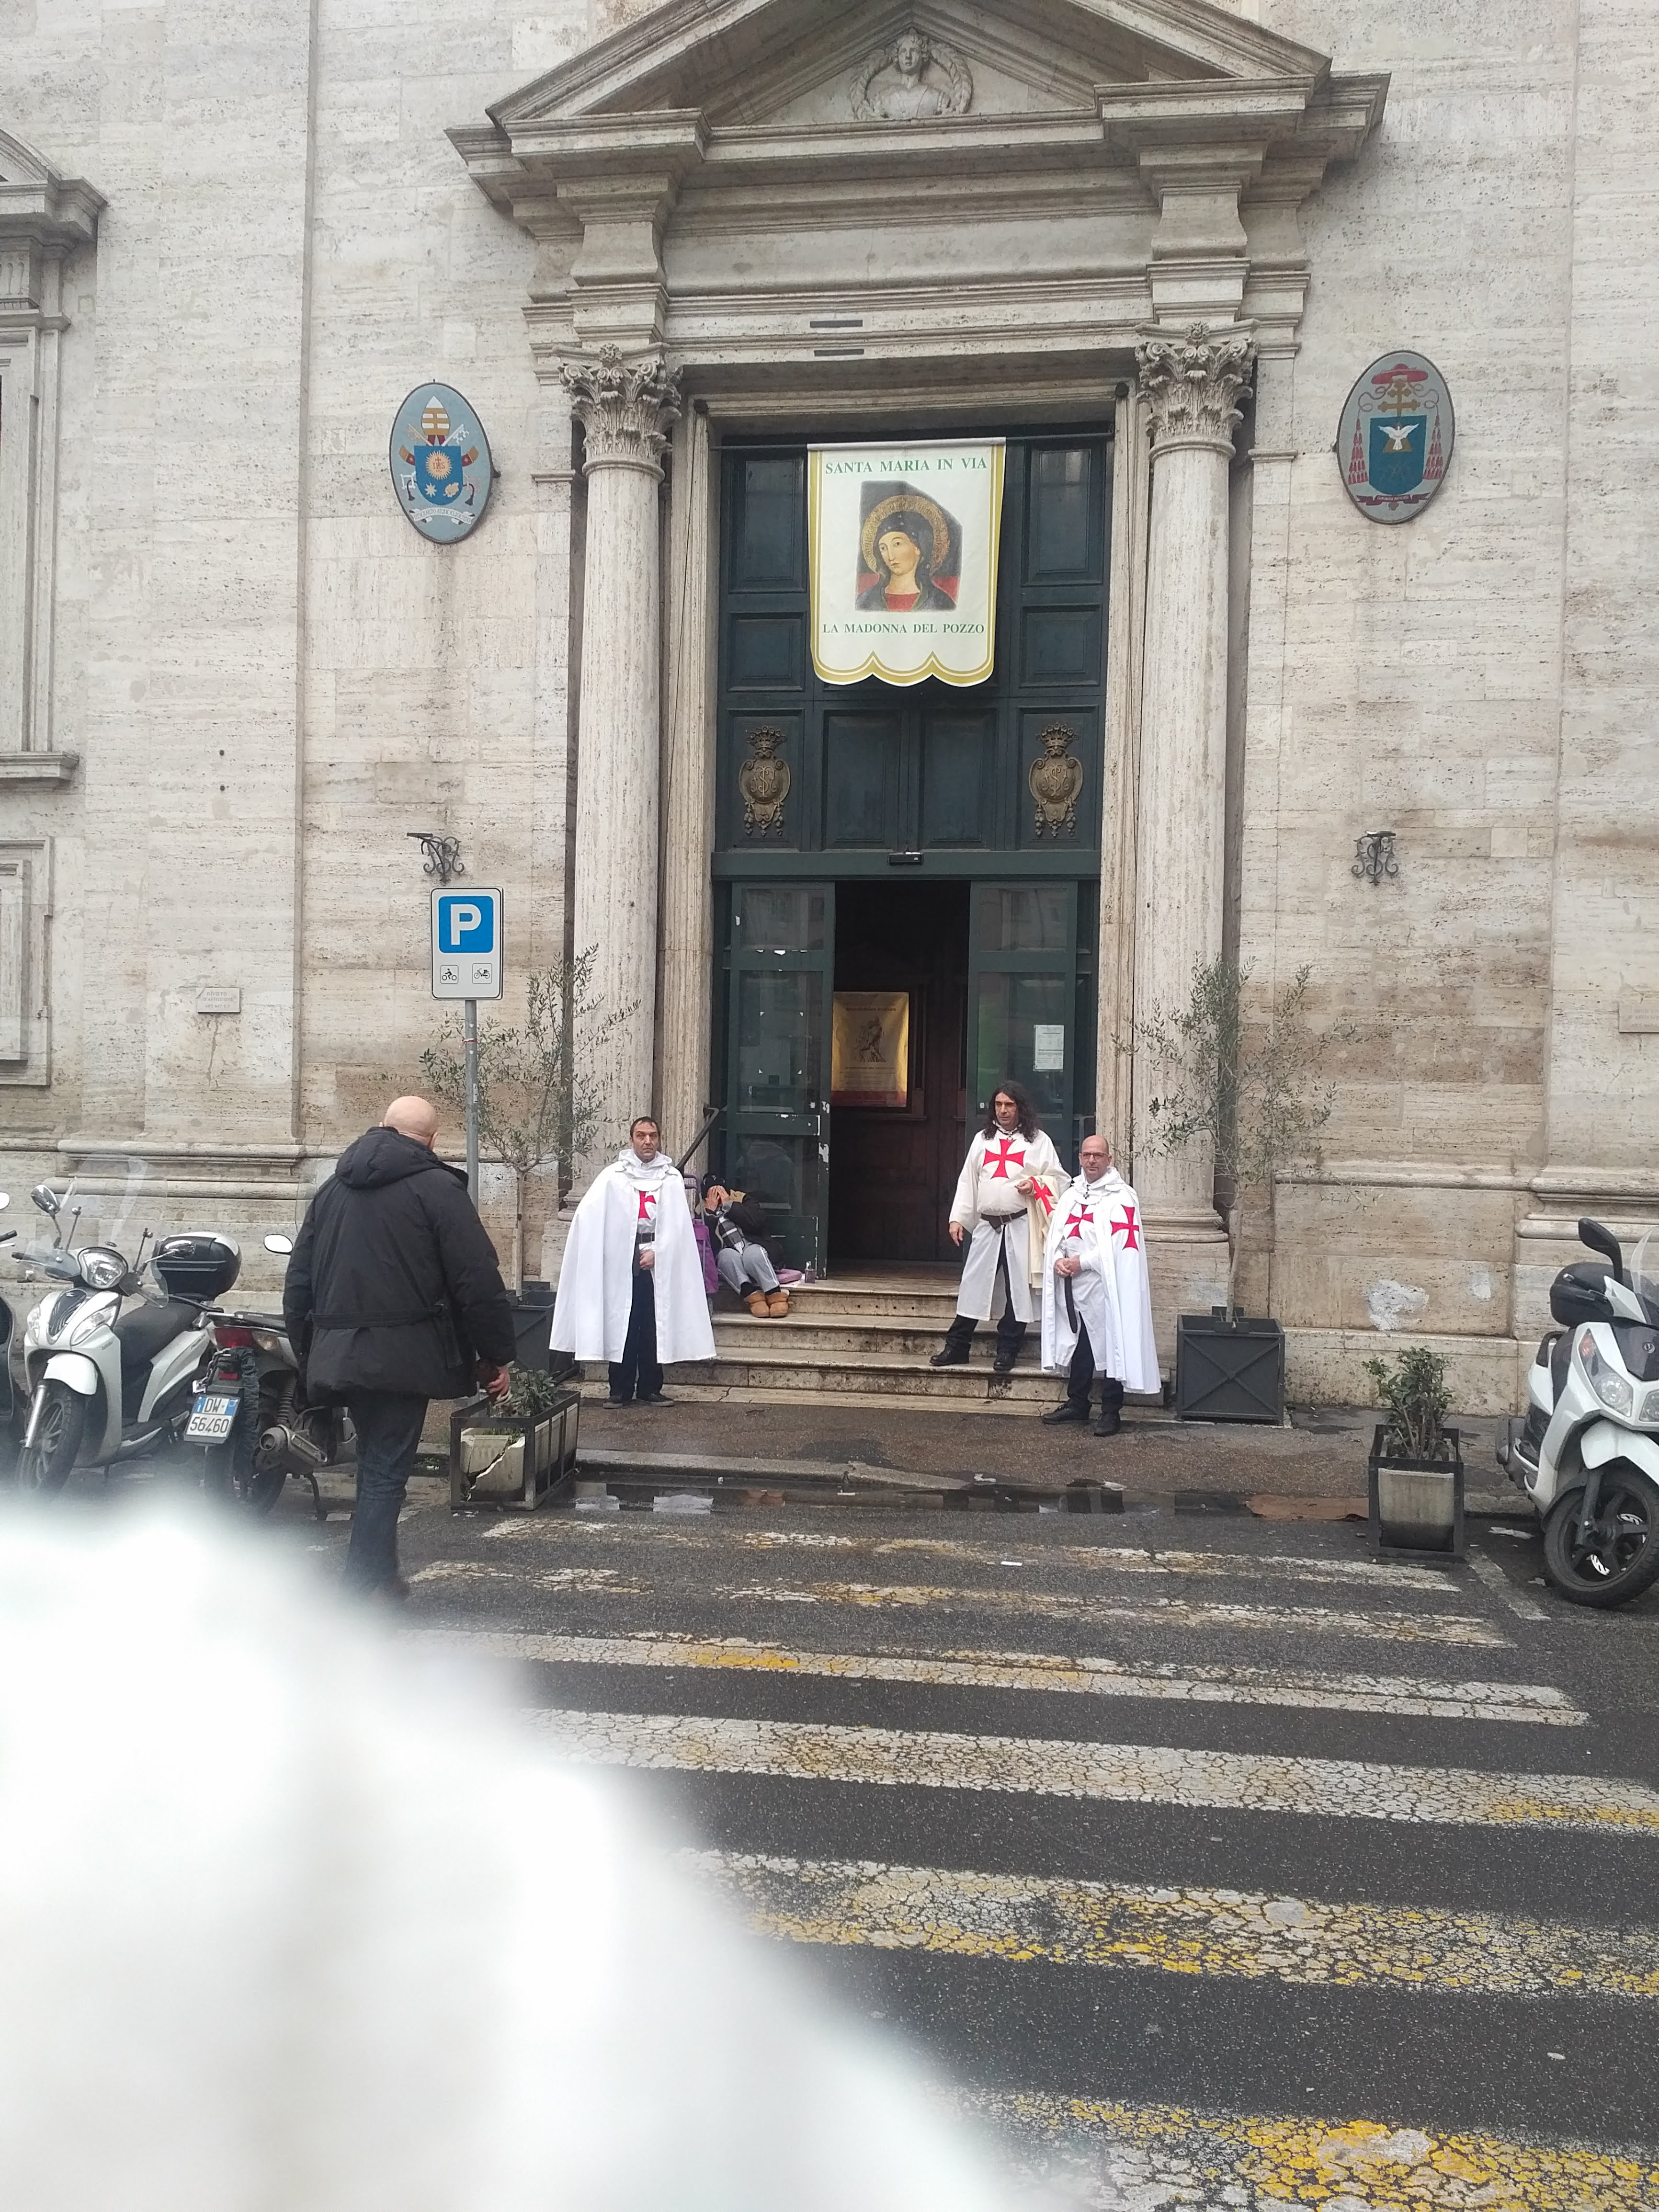 Roma 3-4 mar 2018 - Templari Cattolici foto05